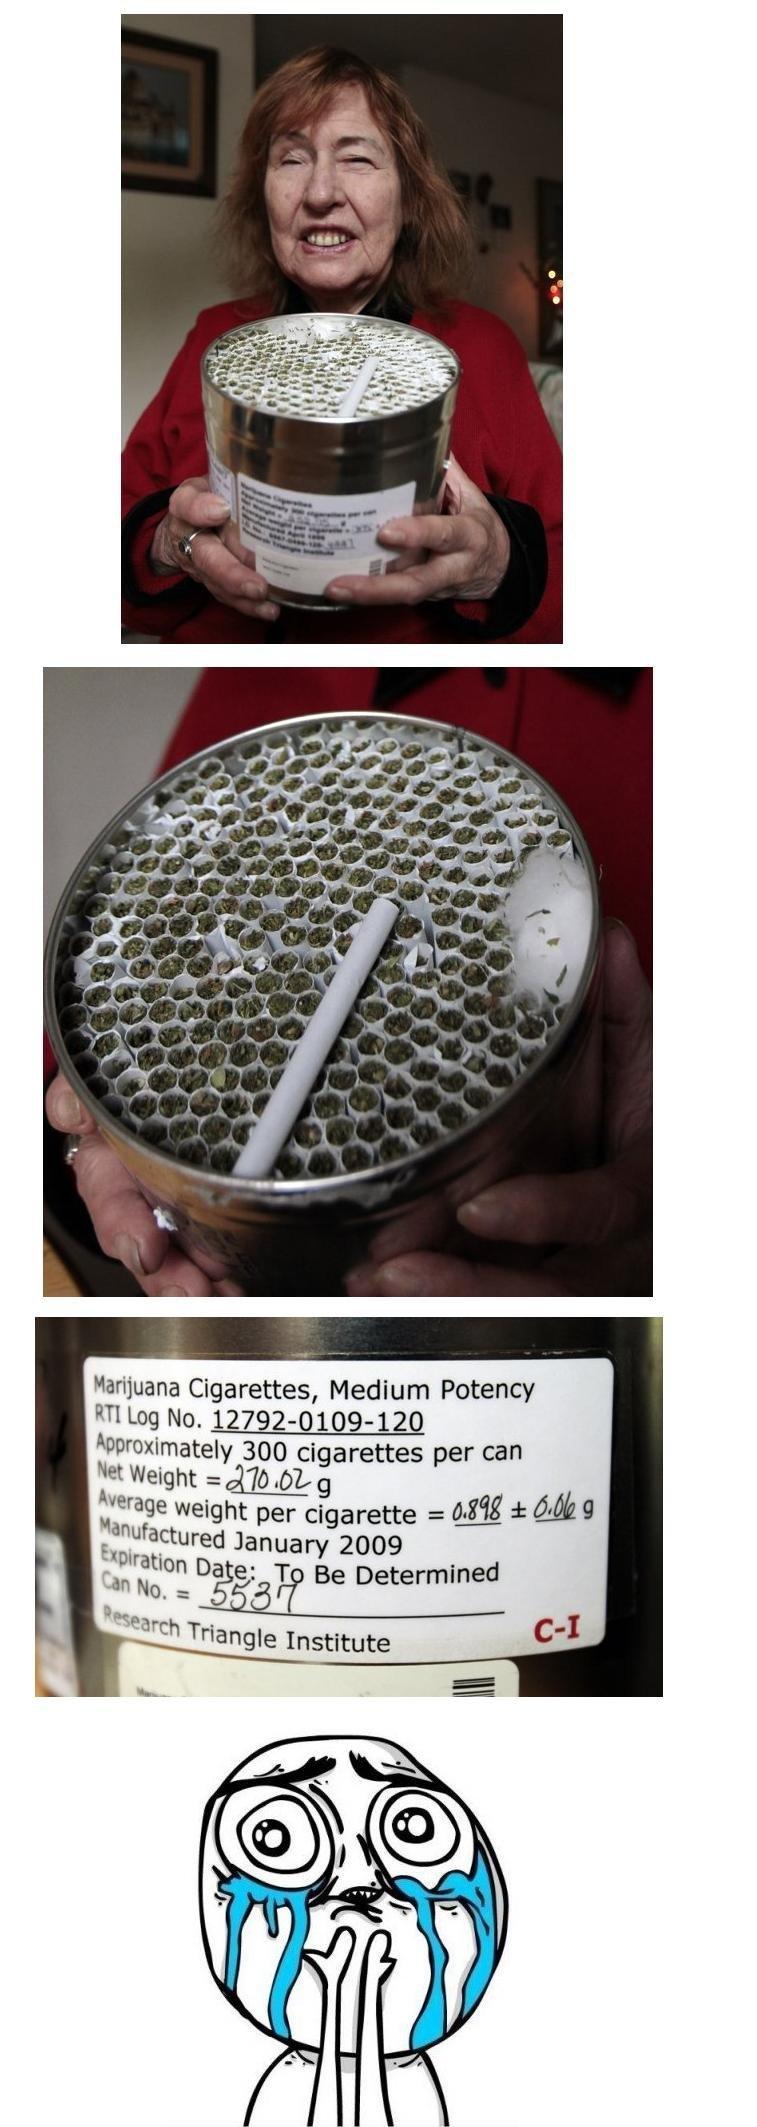 Yesterday. Today. marijuana Cigarettes, Medium Potency approximated